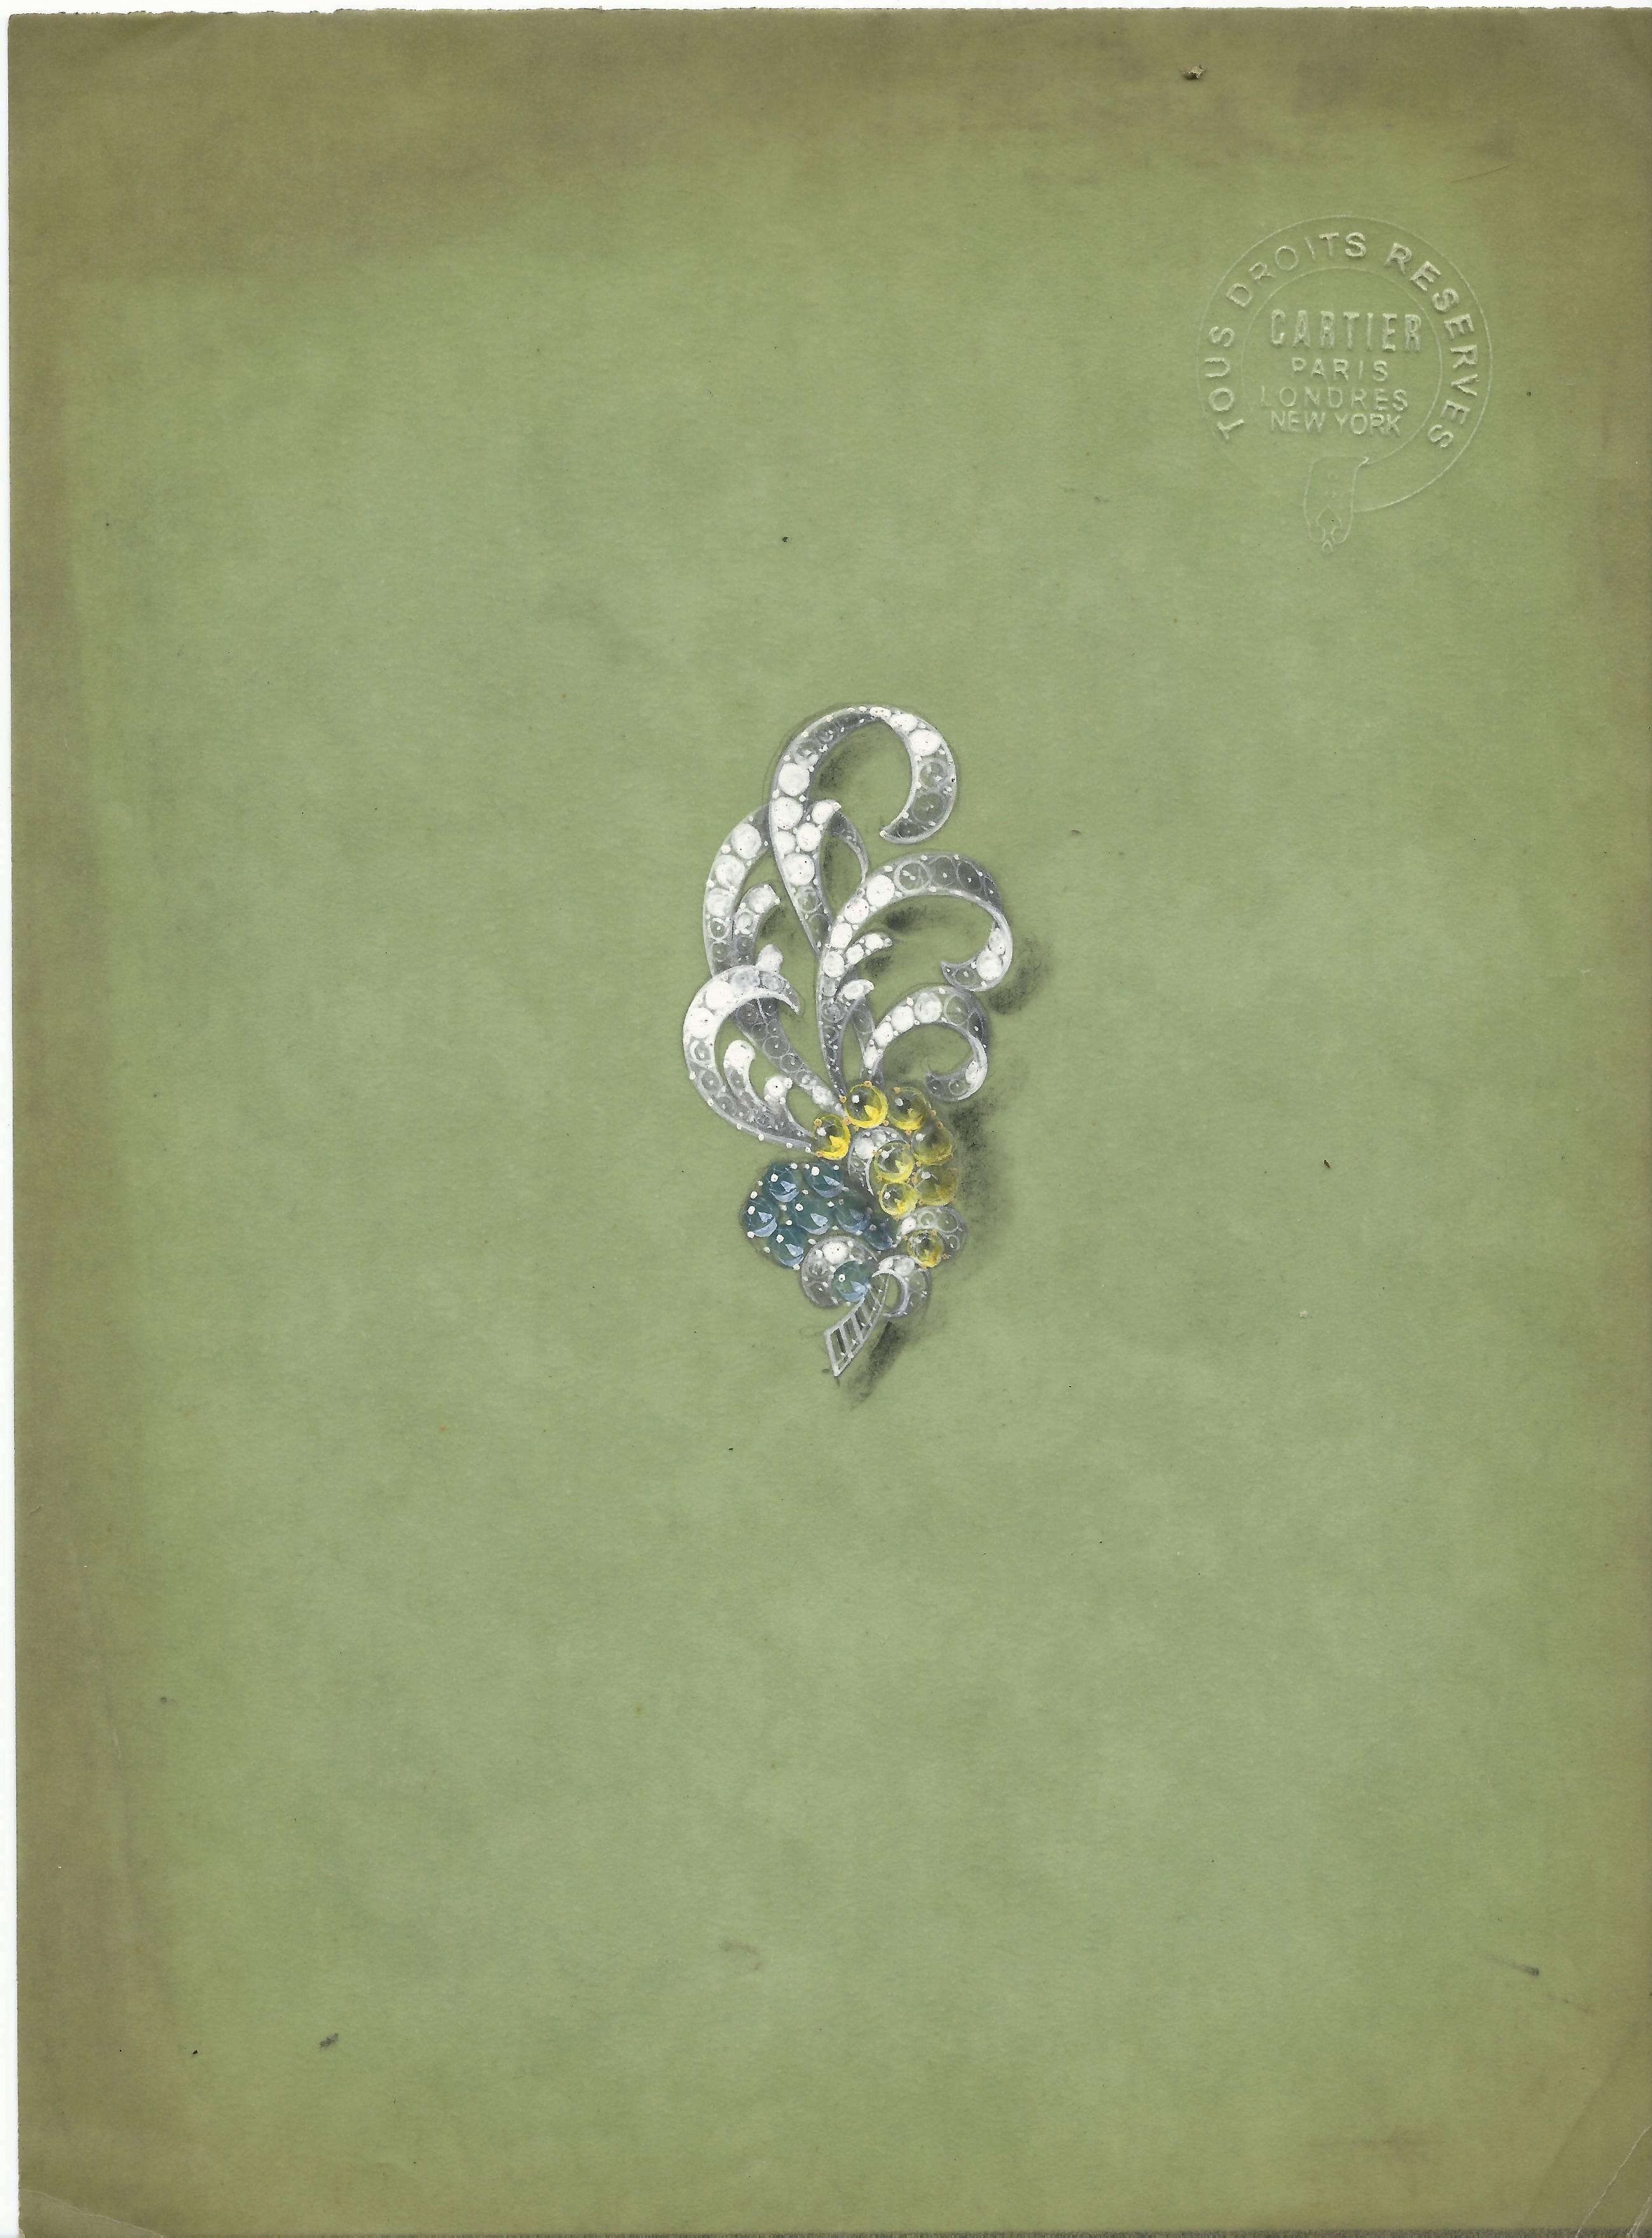 Cartier, ontwerptekening. Foto Grafische Sammlung Stern, papier, blinddruk, verf